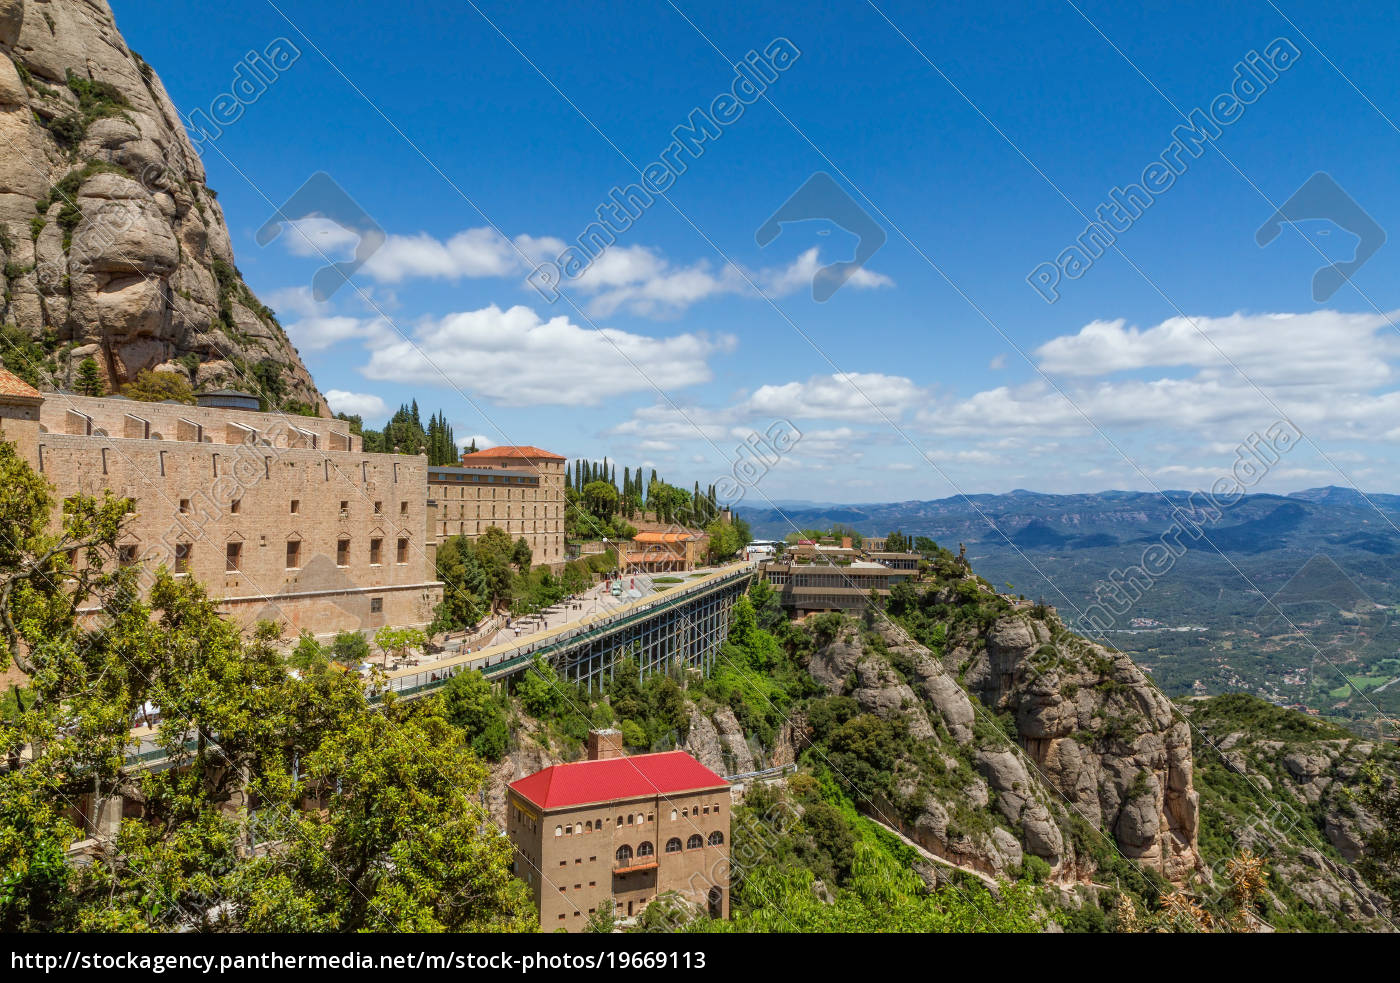 tall, mountain, around, the, monastery, of - 19669113